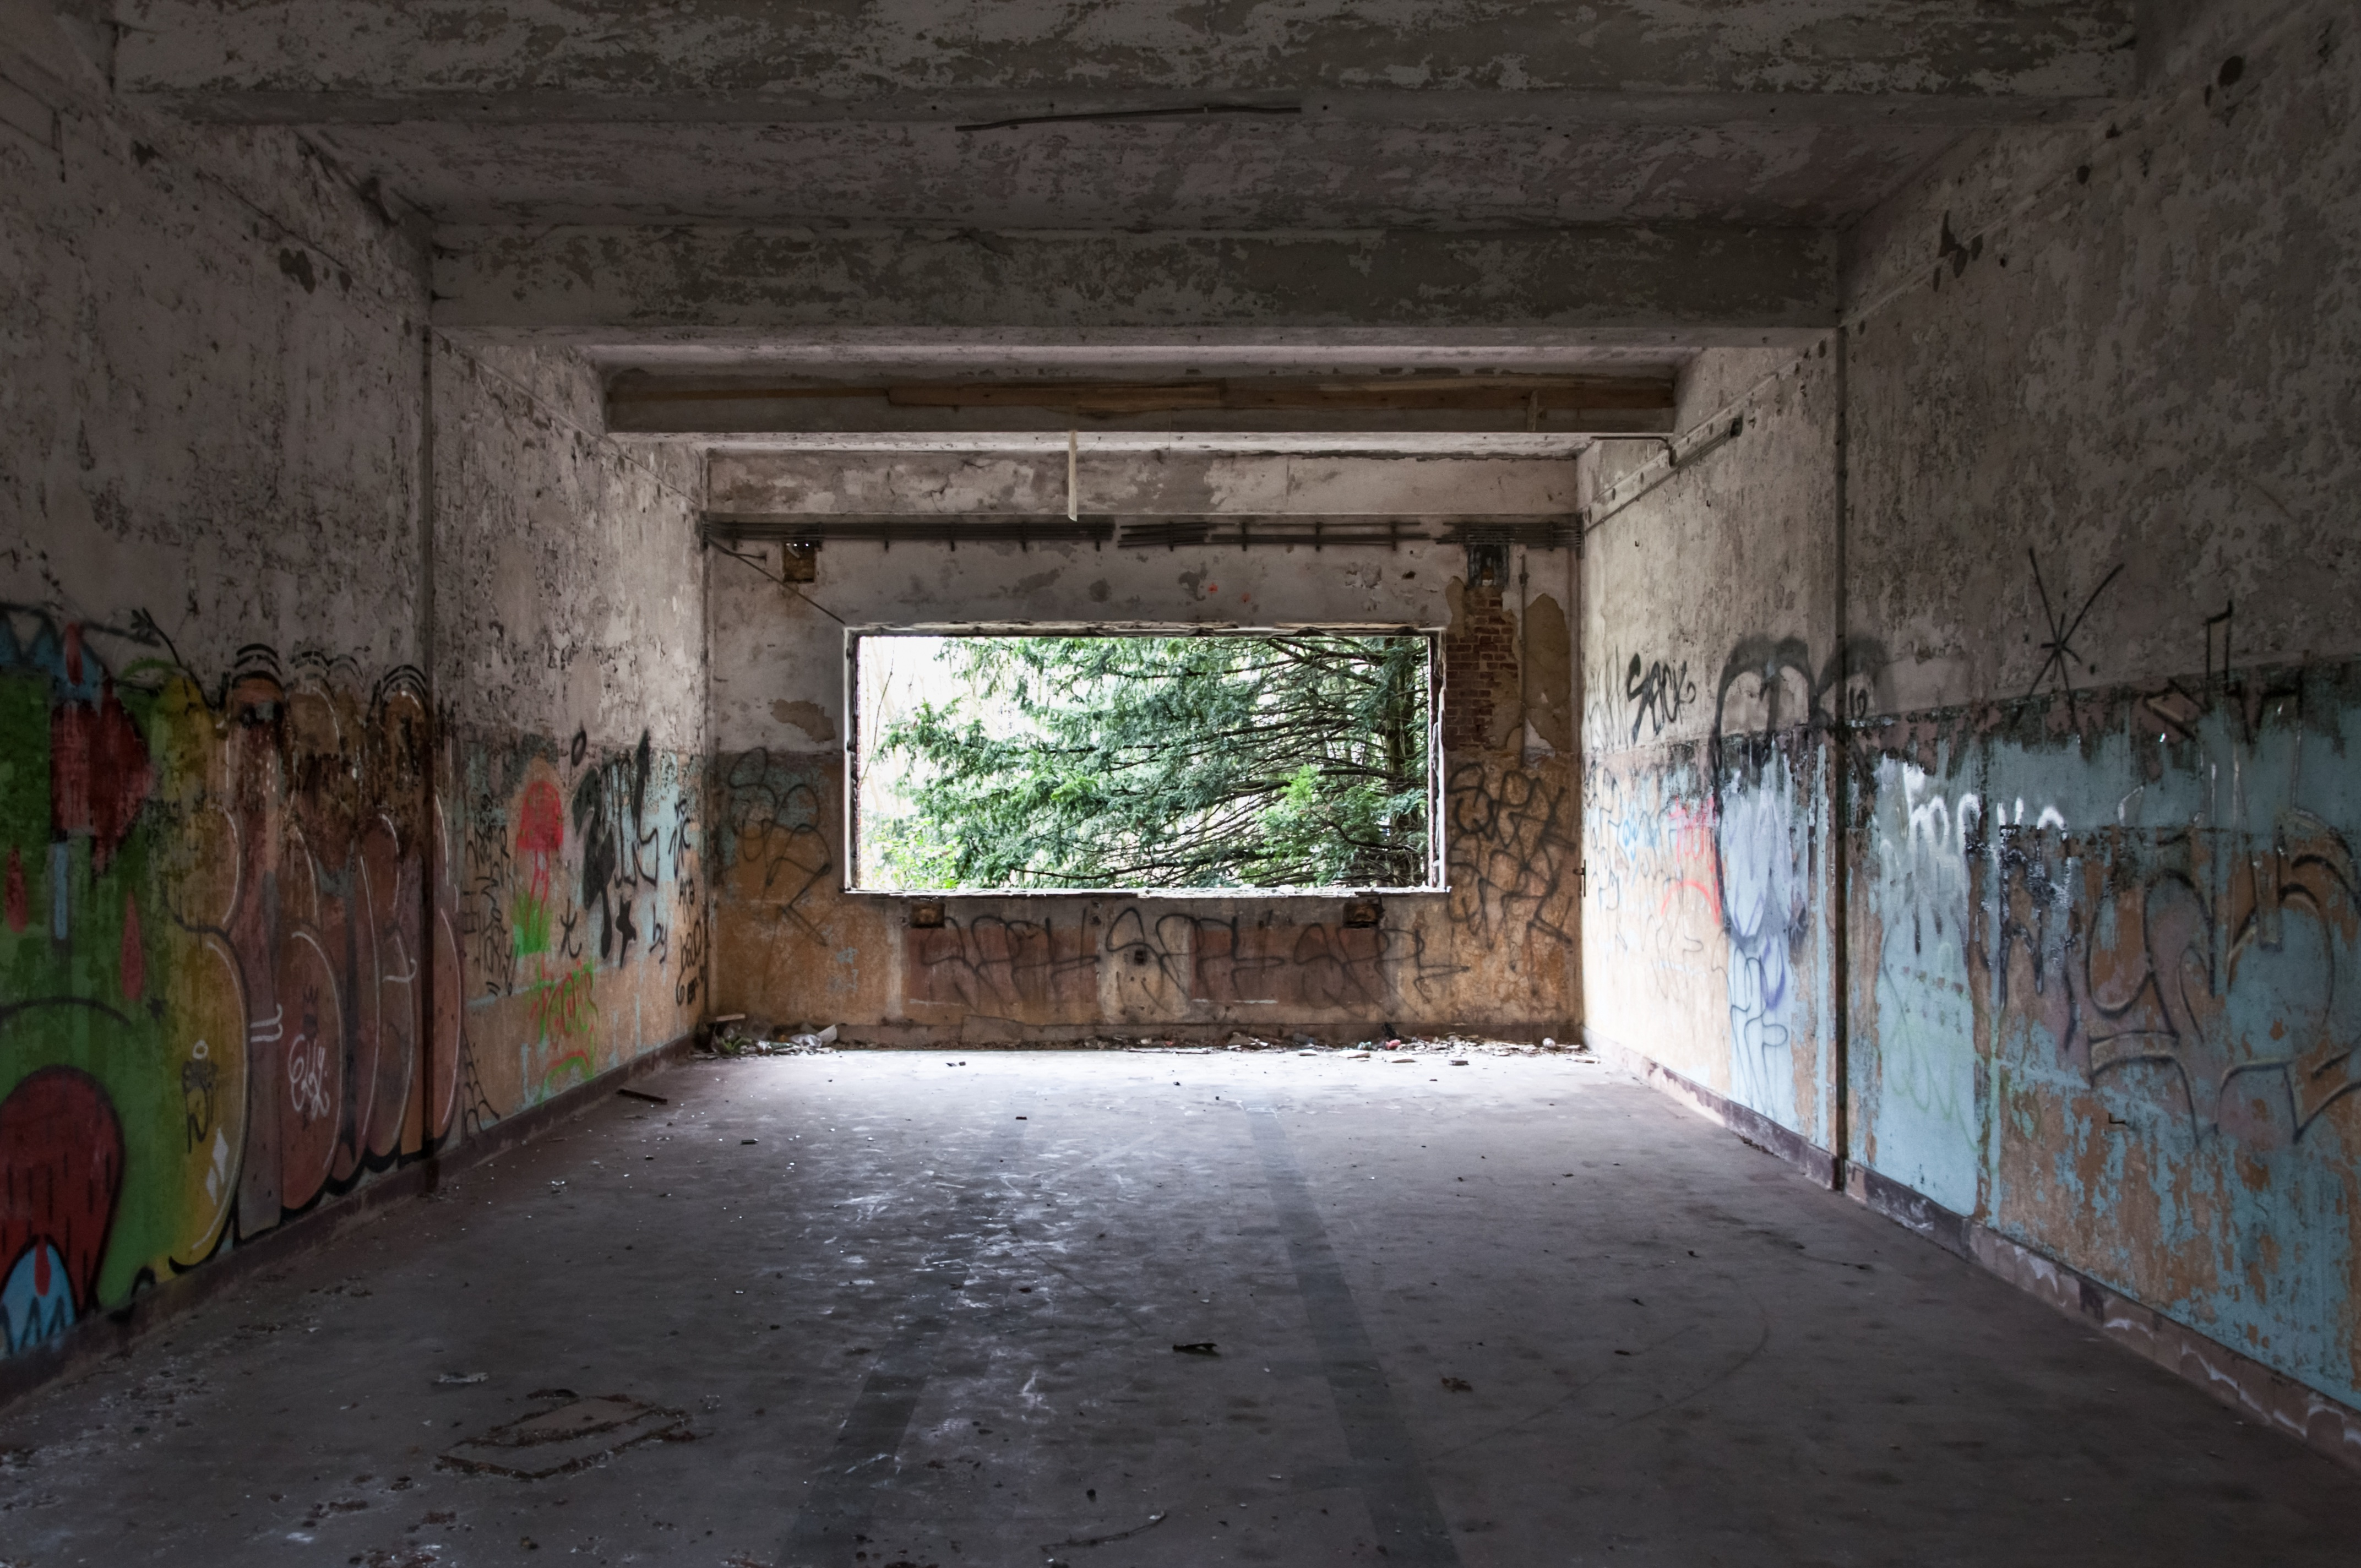 1950s Car Wallpaper Ruin Building Full Of Graffiti Artworks During Daytime